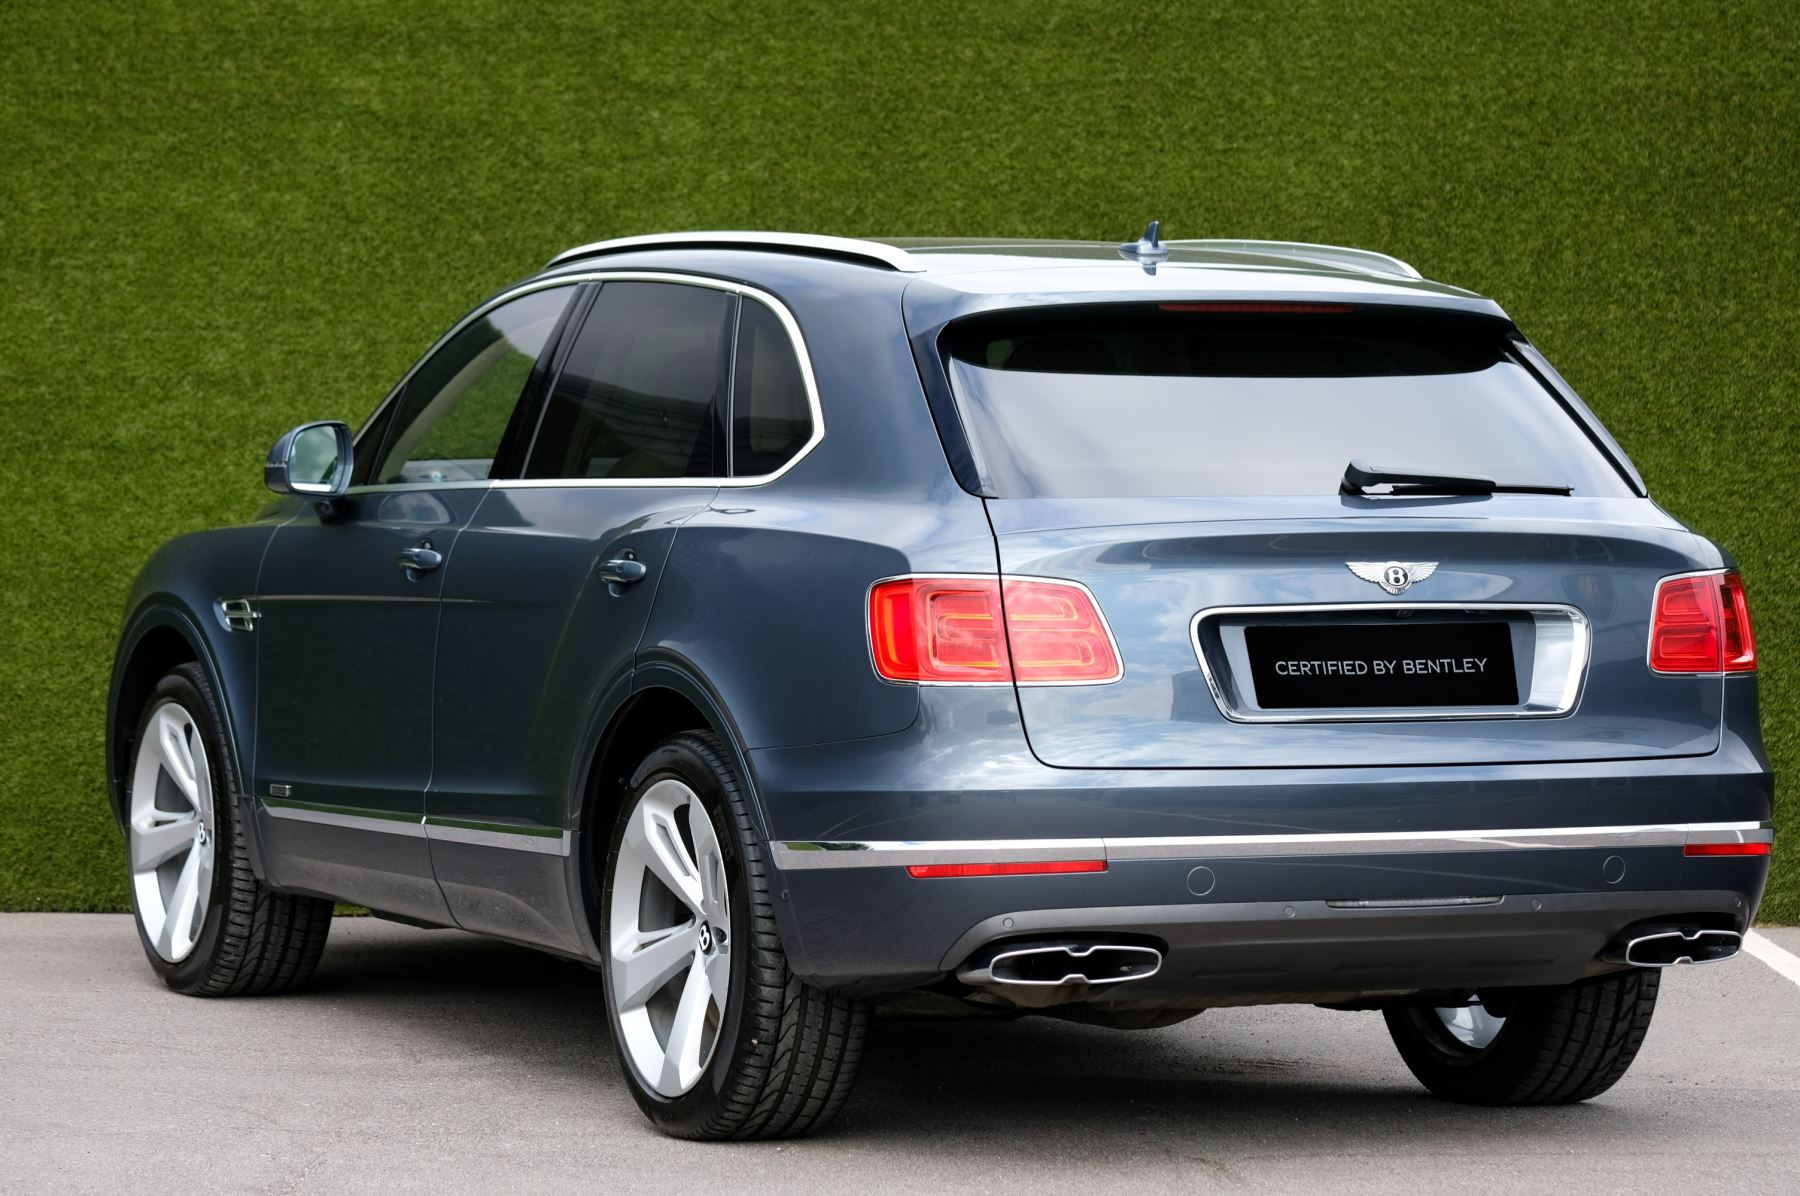 Bentley Bentayga 4.0 V8 5dr - Mulliner Driving Specification - City & Tour Specification image 5